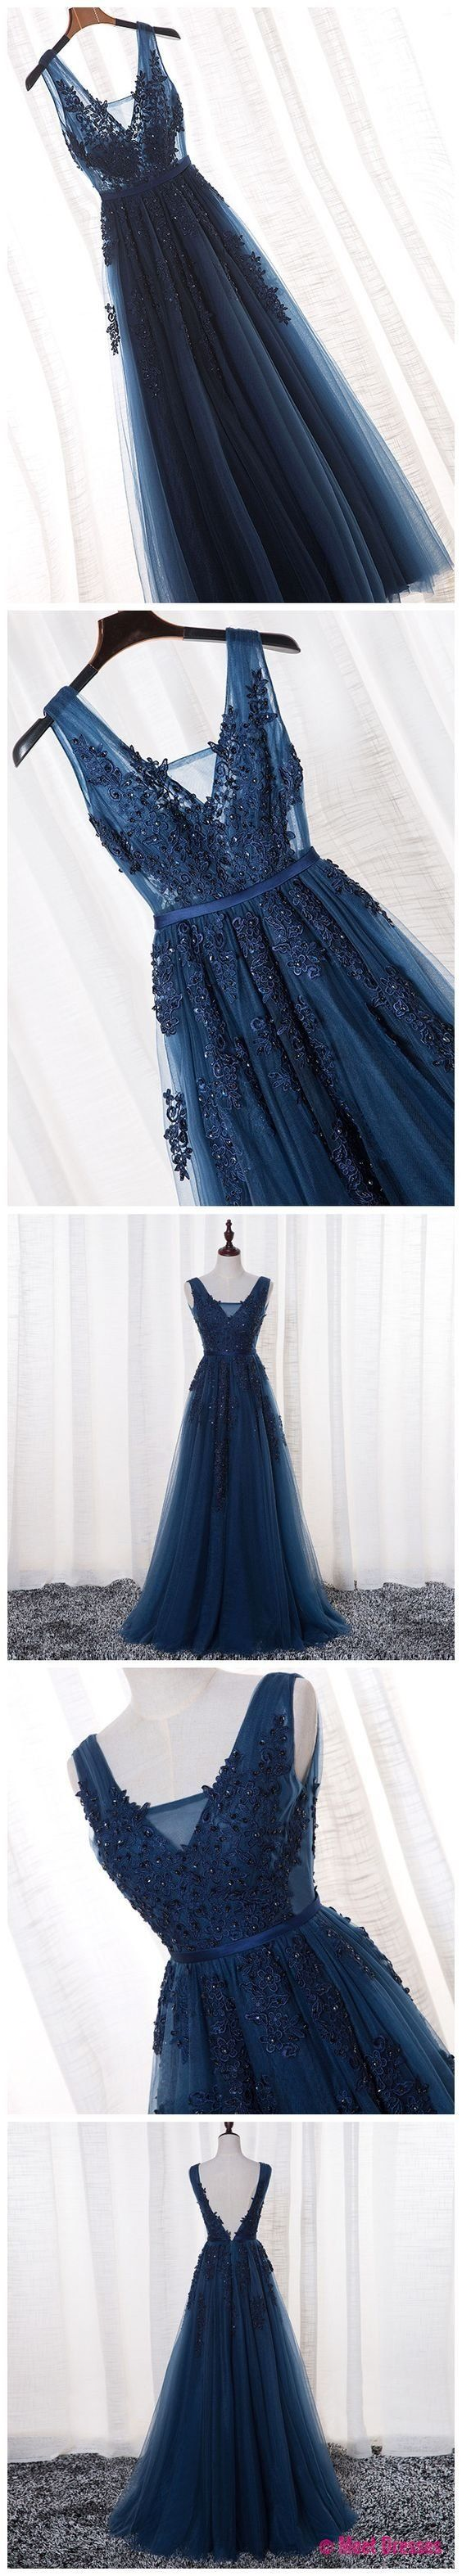 Long prom dress beaded prom dressesgraduation party dresses prom